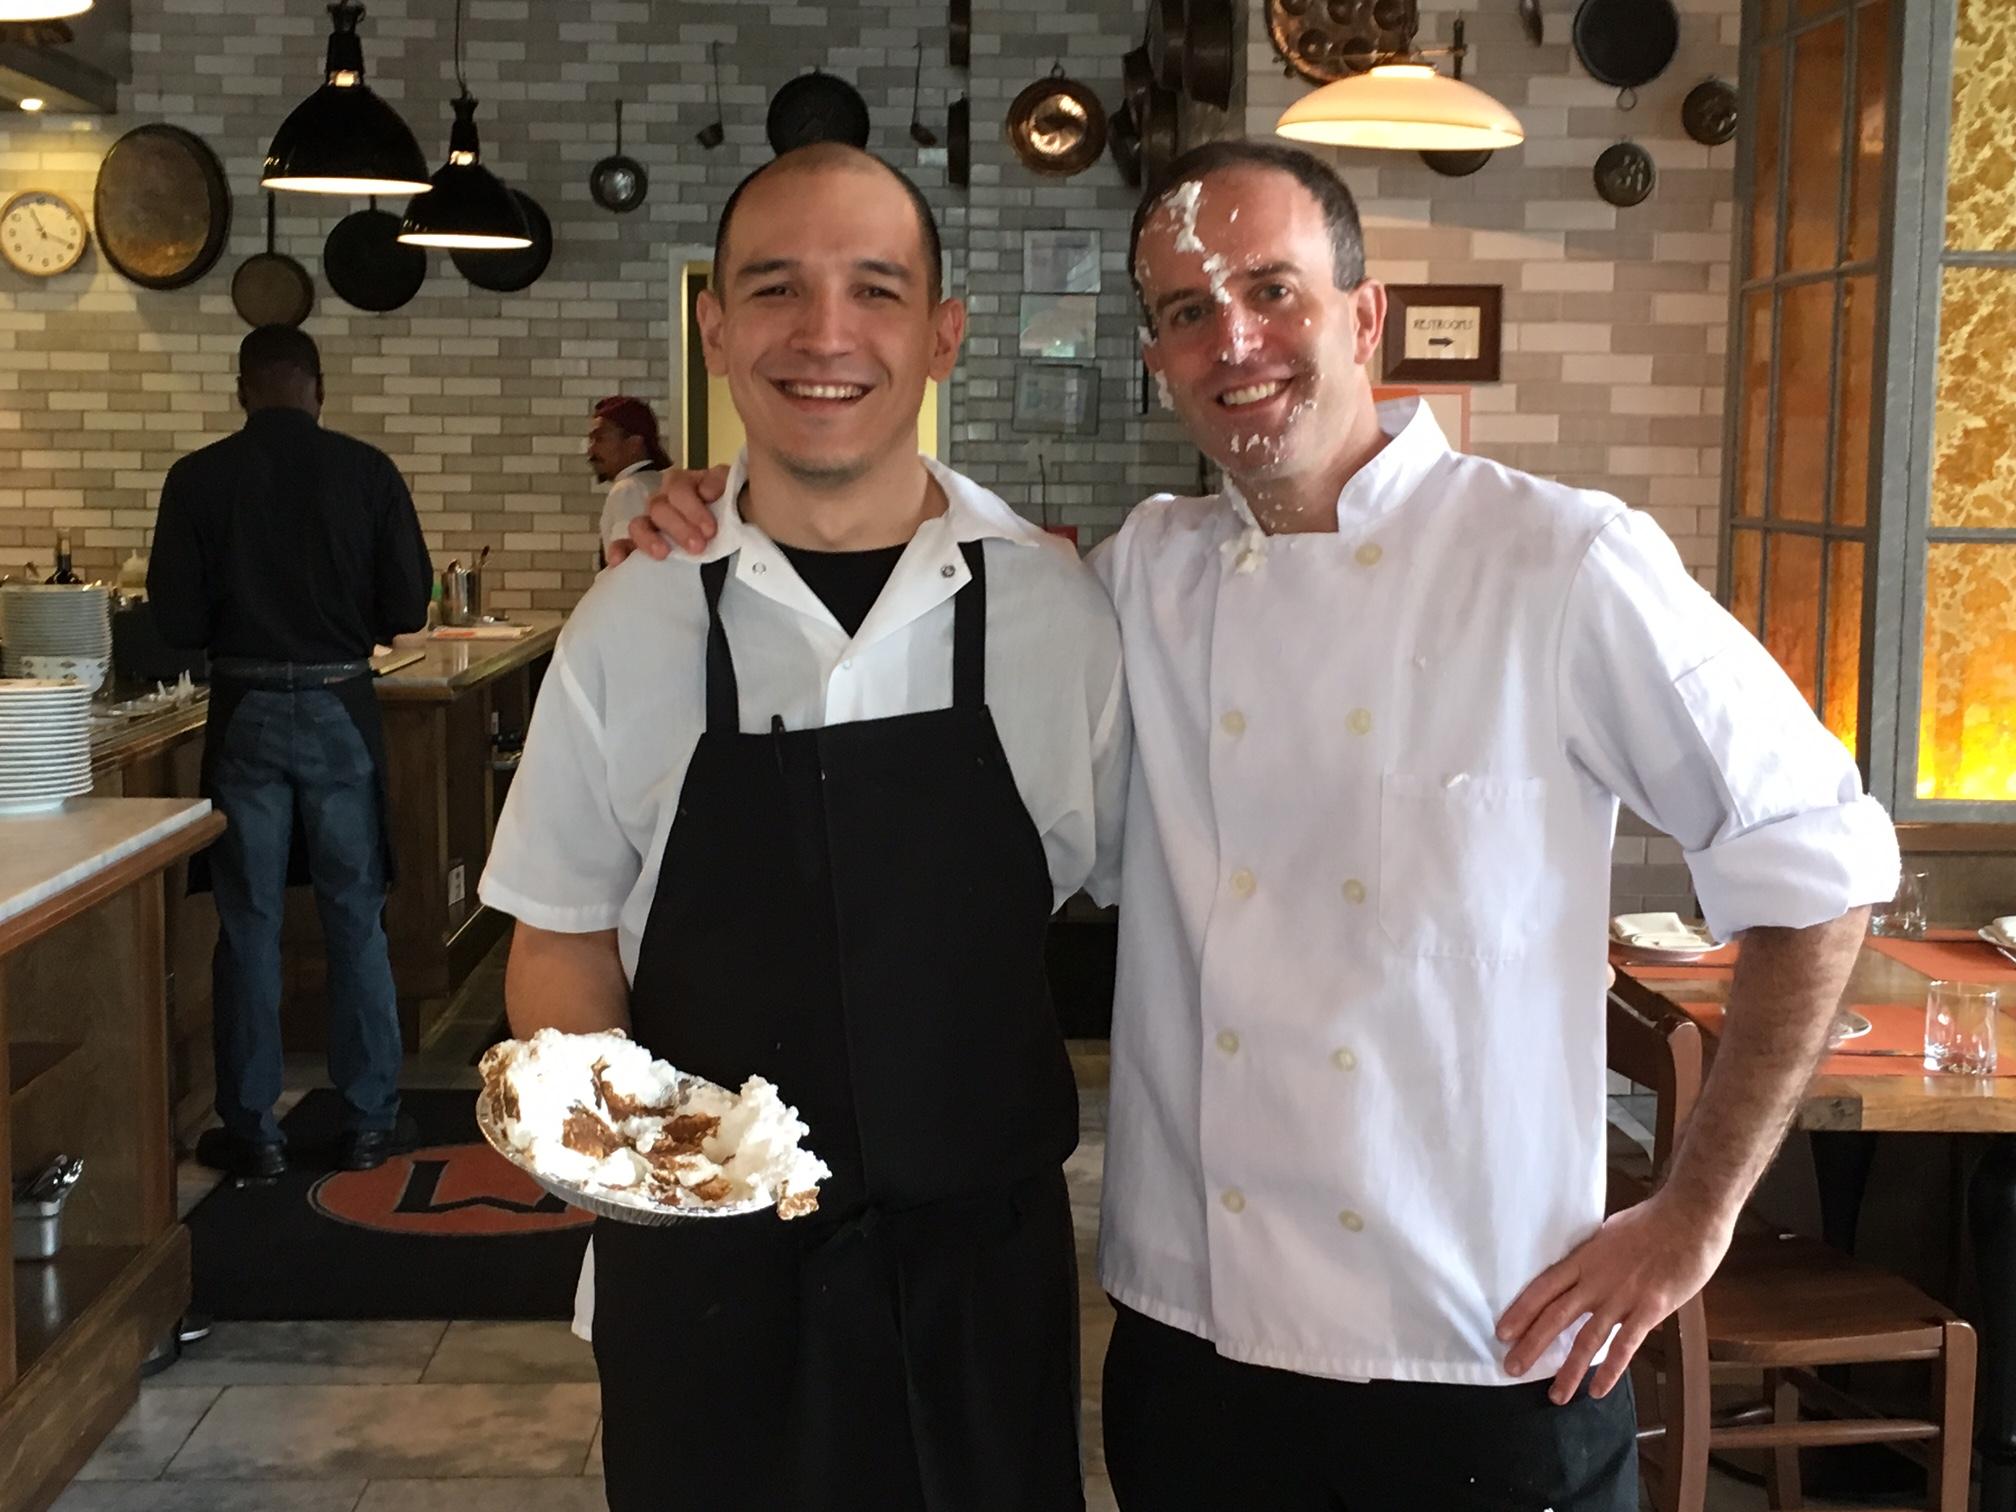 Chefs celebrating event